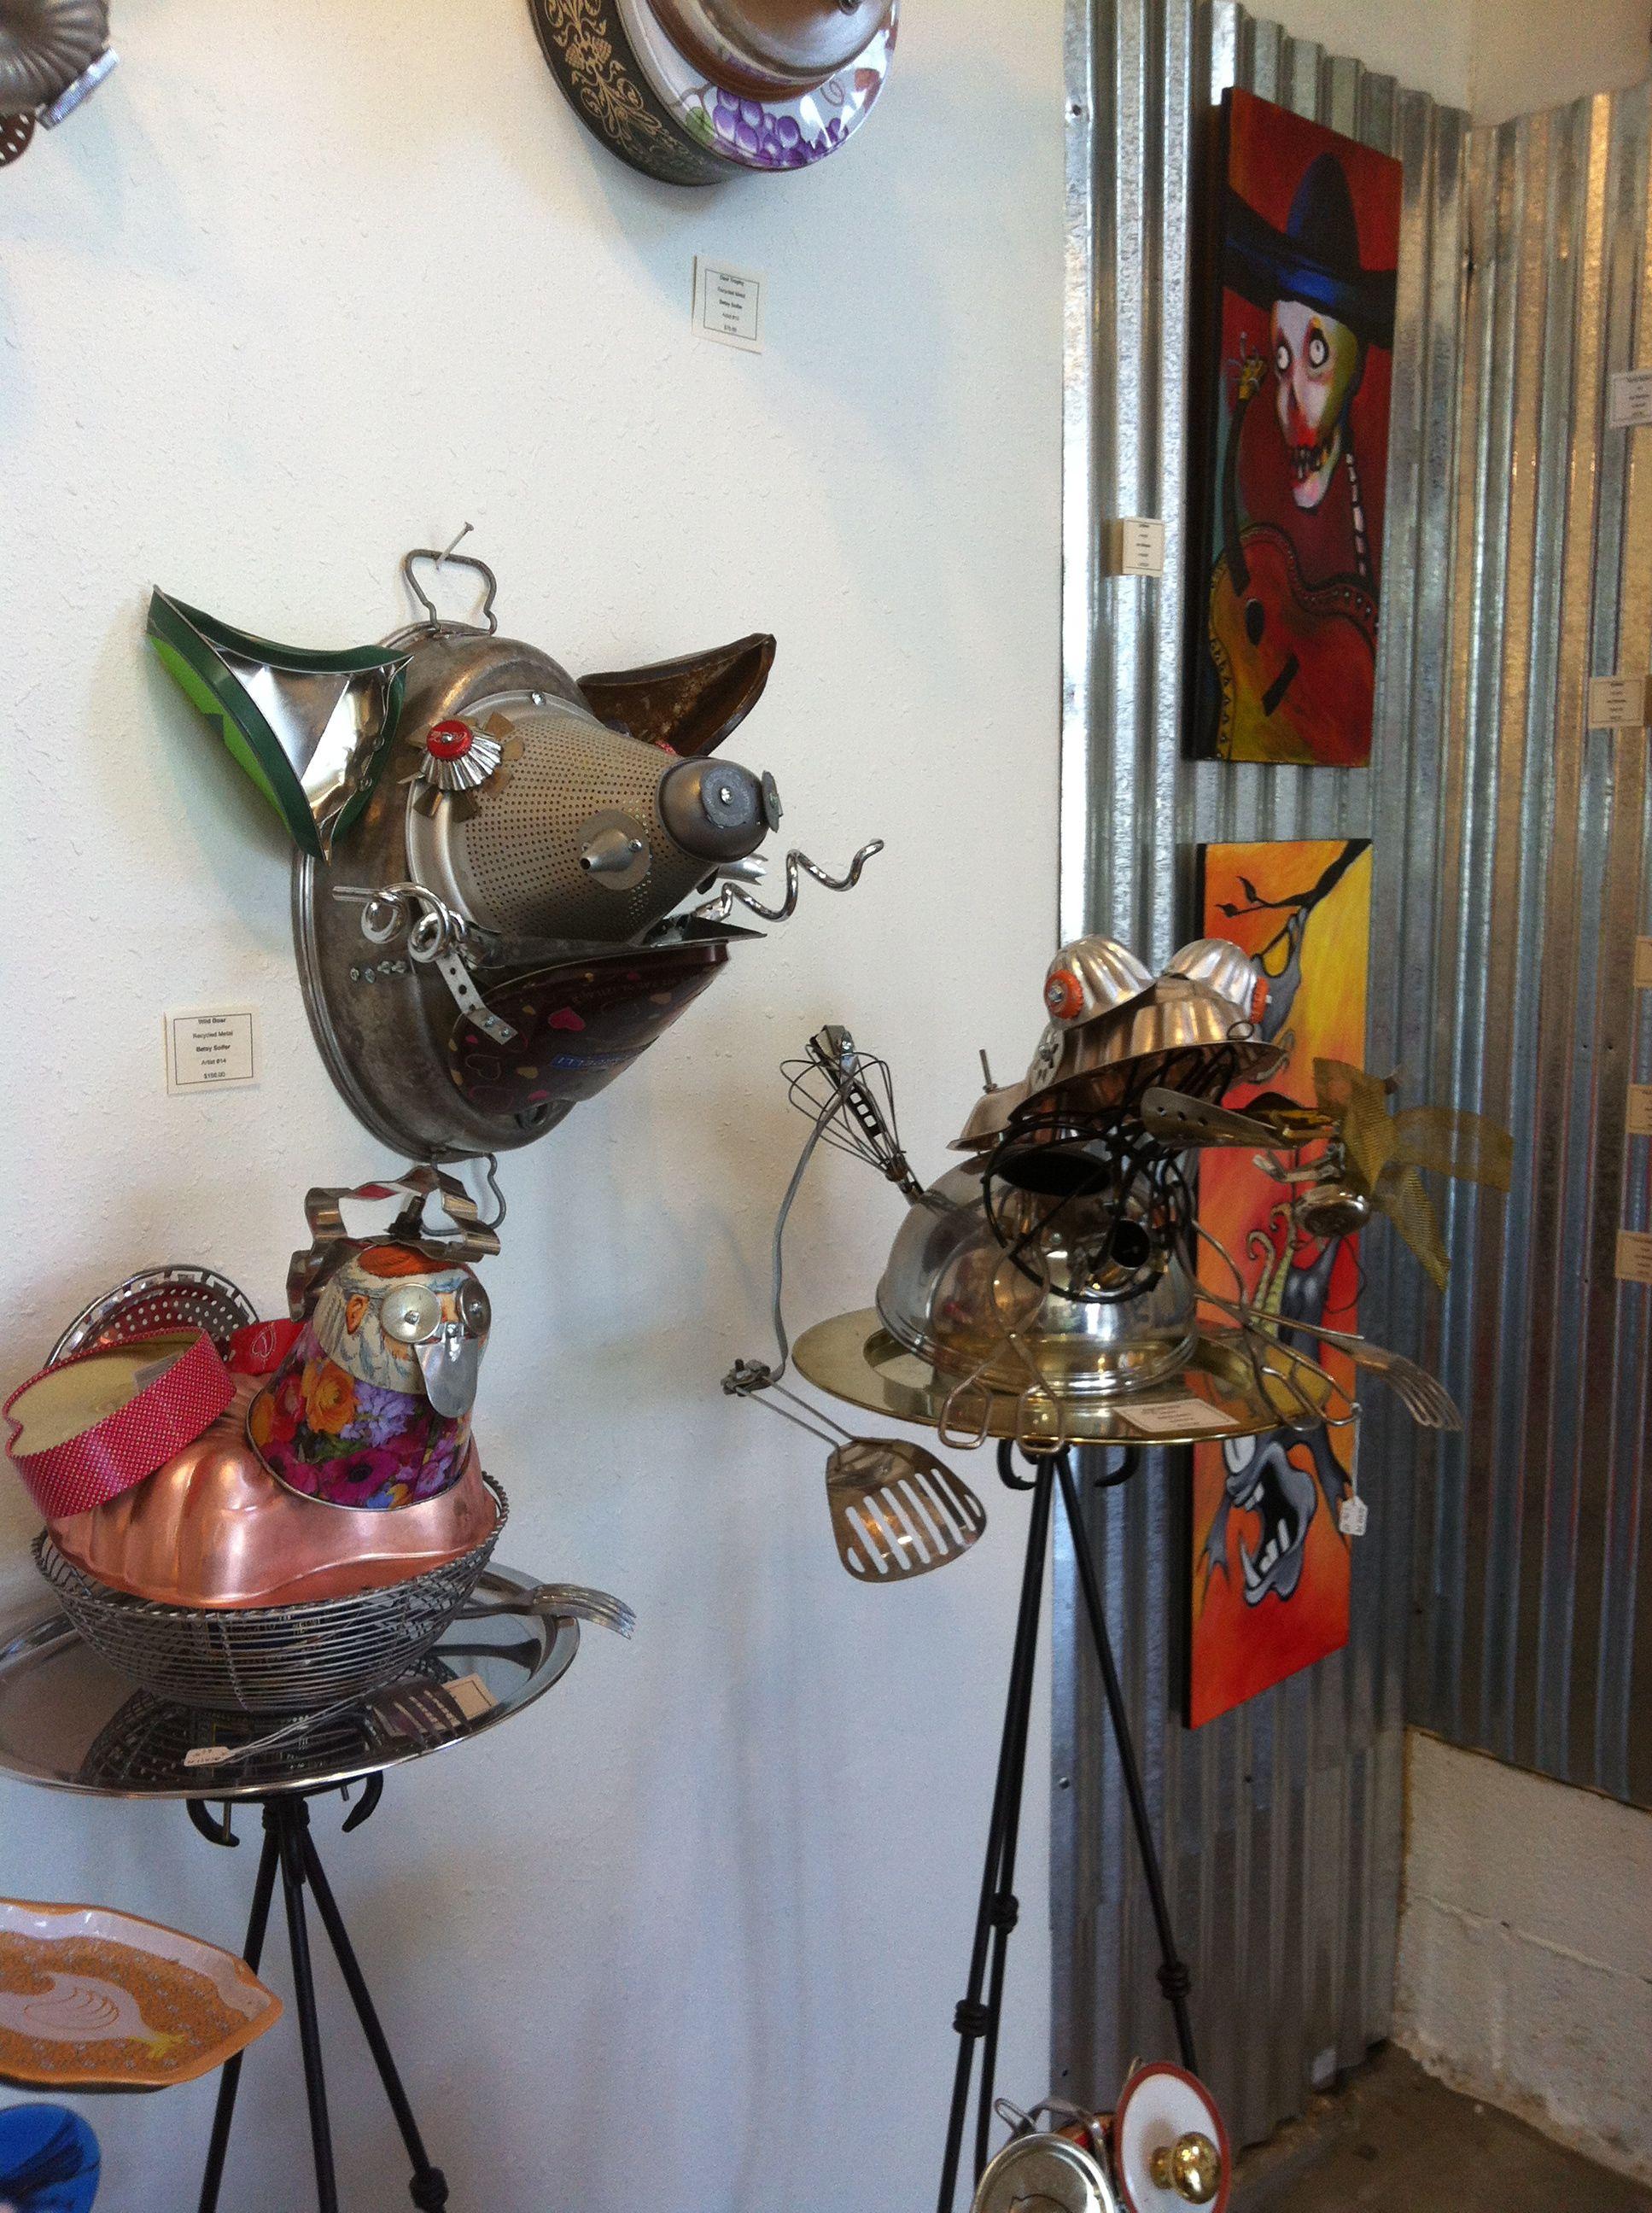 welded art | Junk metal art, Metal yard art, Metal art